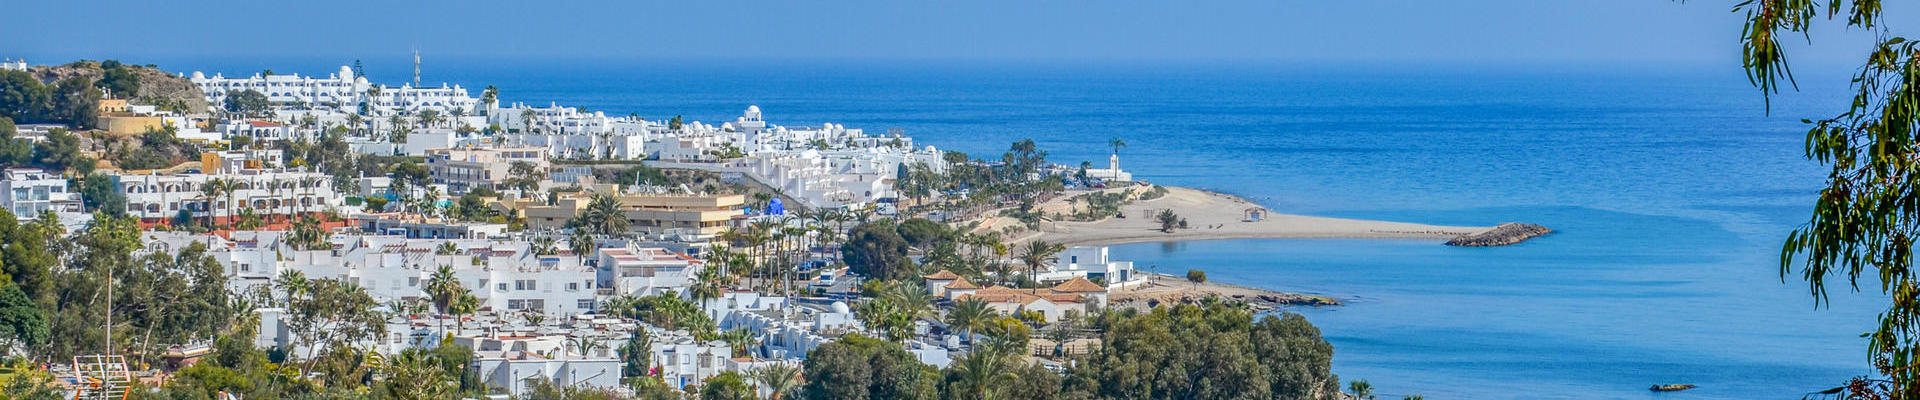 View Playa